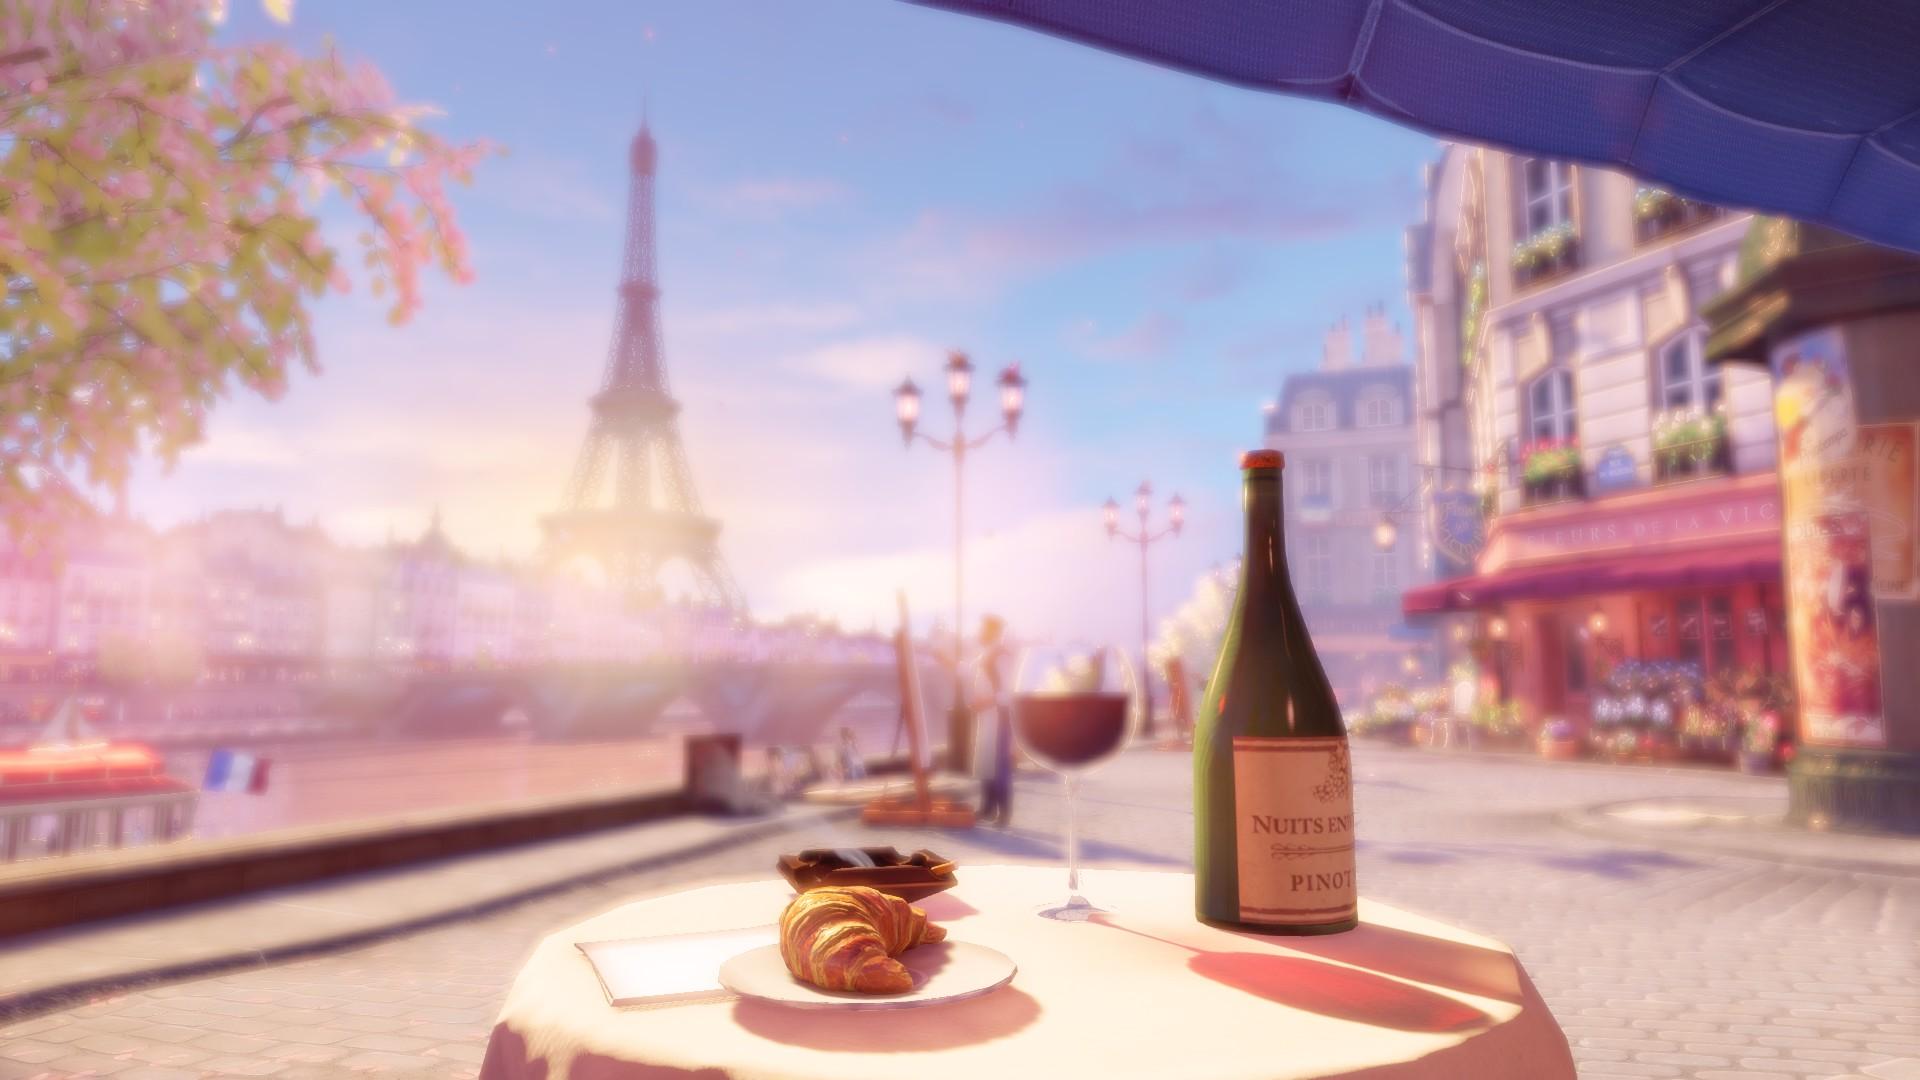 Eiffel-Tower-HD-Backgrounds-wallpaper-wpc5804540